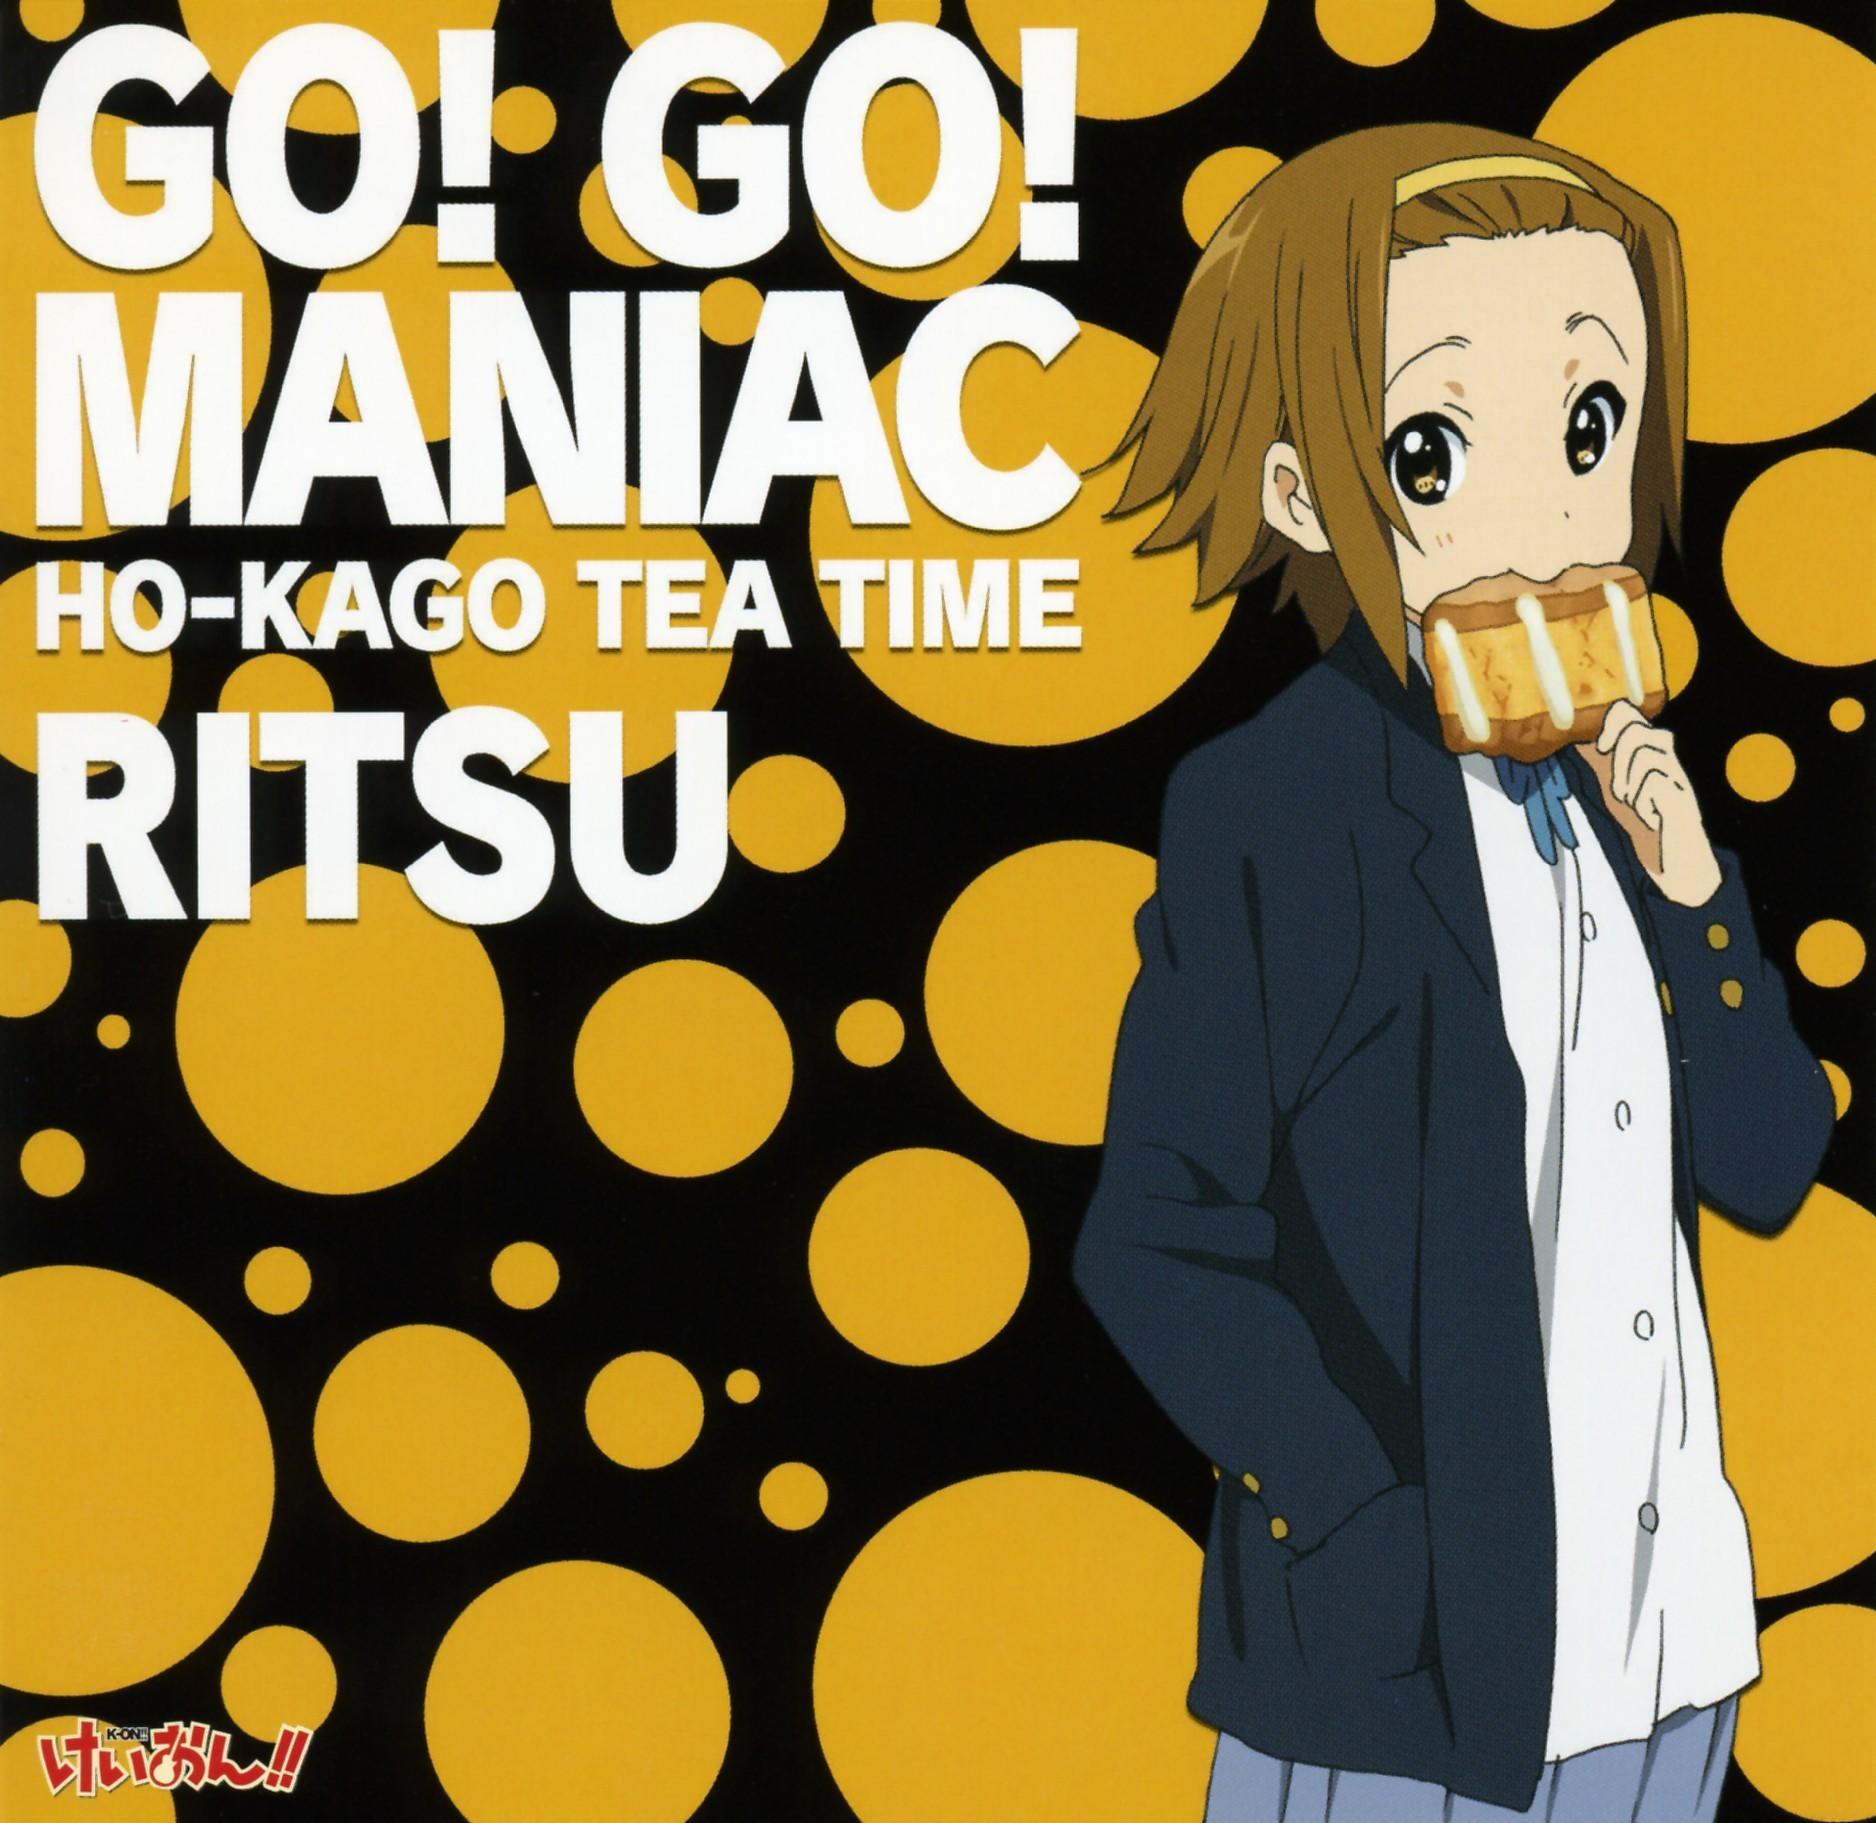 GO! GO! Maniac Ritsu